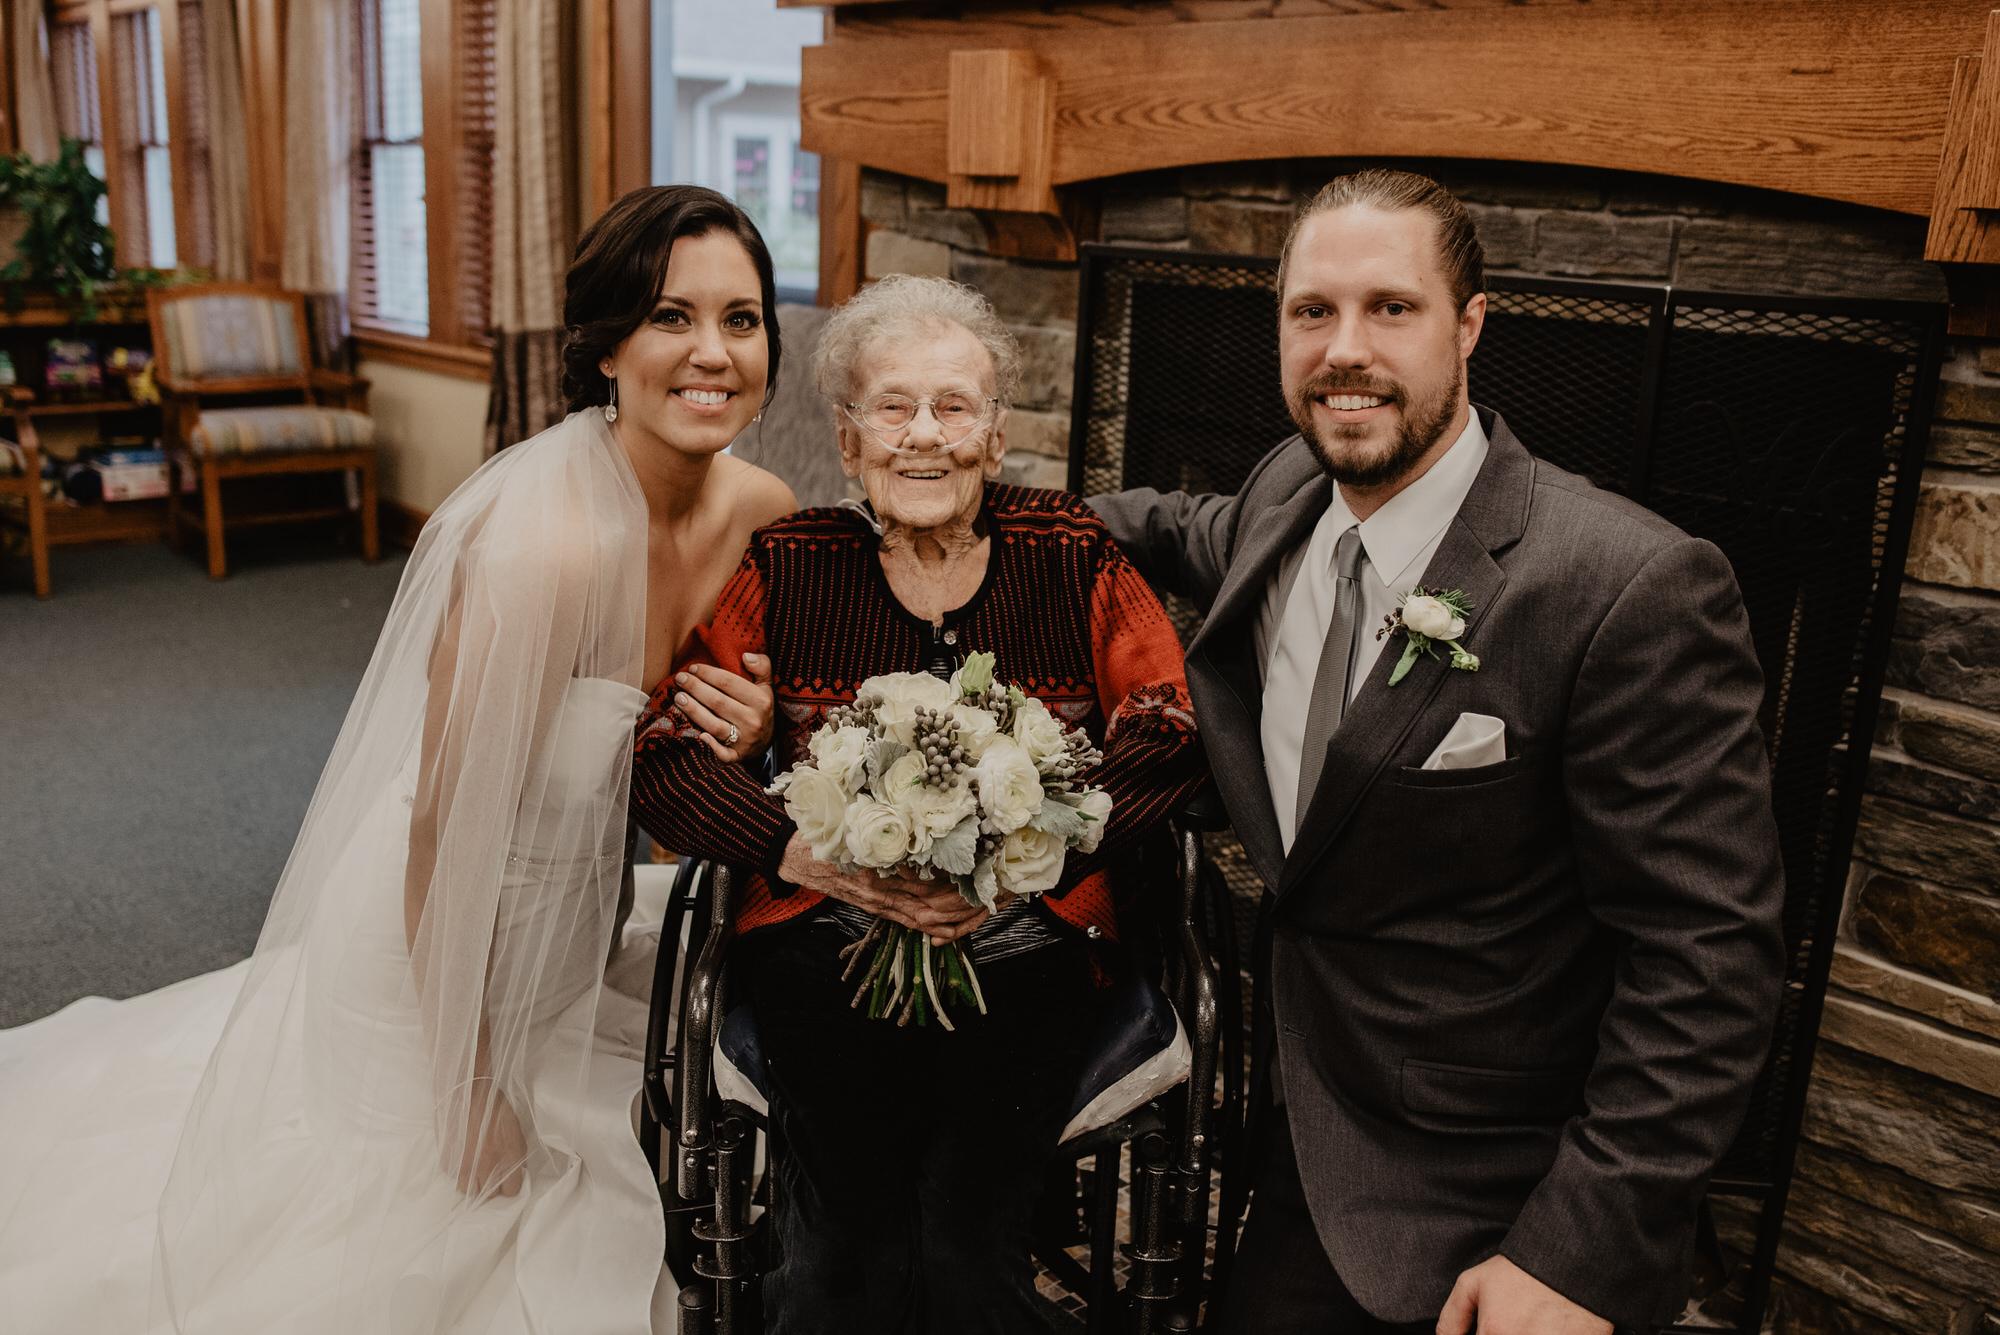 Kaylie_Sirek_Photography_Grand_Island_Kearney_Hastings_Lincoln_Nebraska_Wedding_Engagement_Grandma_Grandparent_Delray_Downtown_DowntownLincoln_LNK_Emotional_Bride_Groom_Photographer_41.jpg